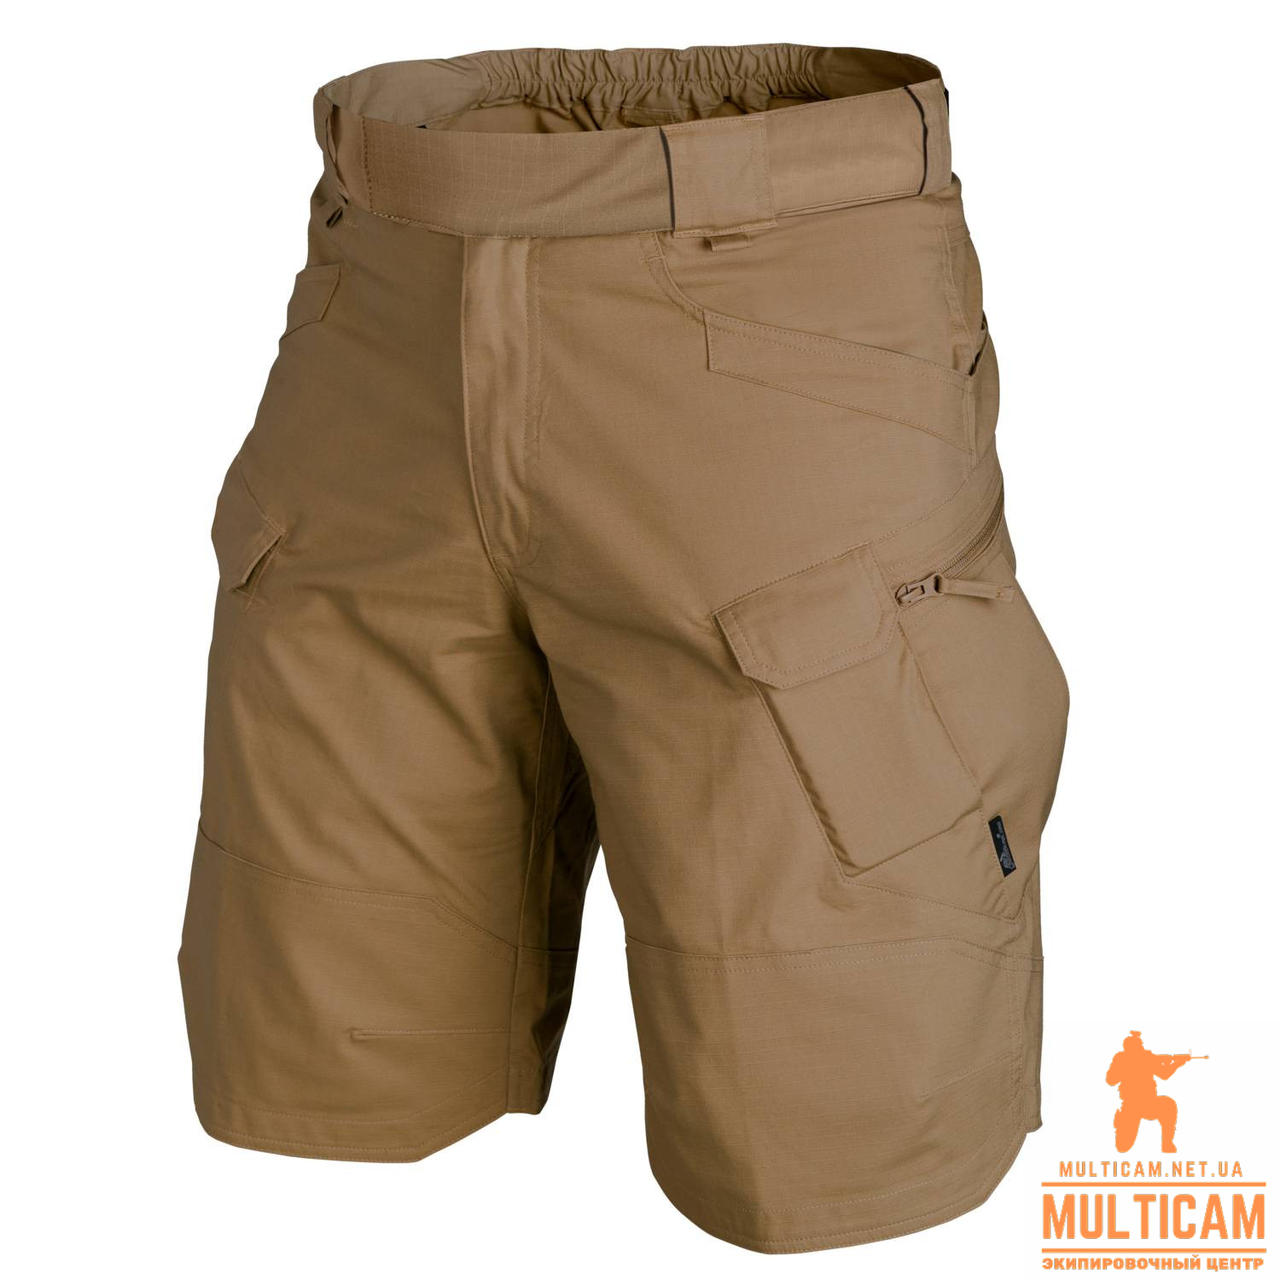 Шорти Helikon-Tex® UTS® (Urban Shorts®) 11 - PolyCotton Ripstop - Coyote